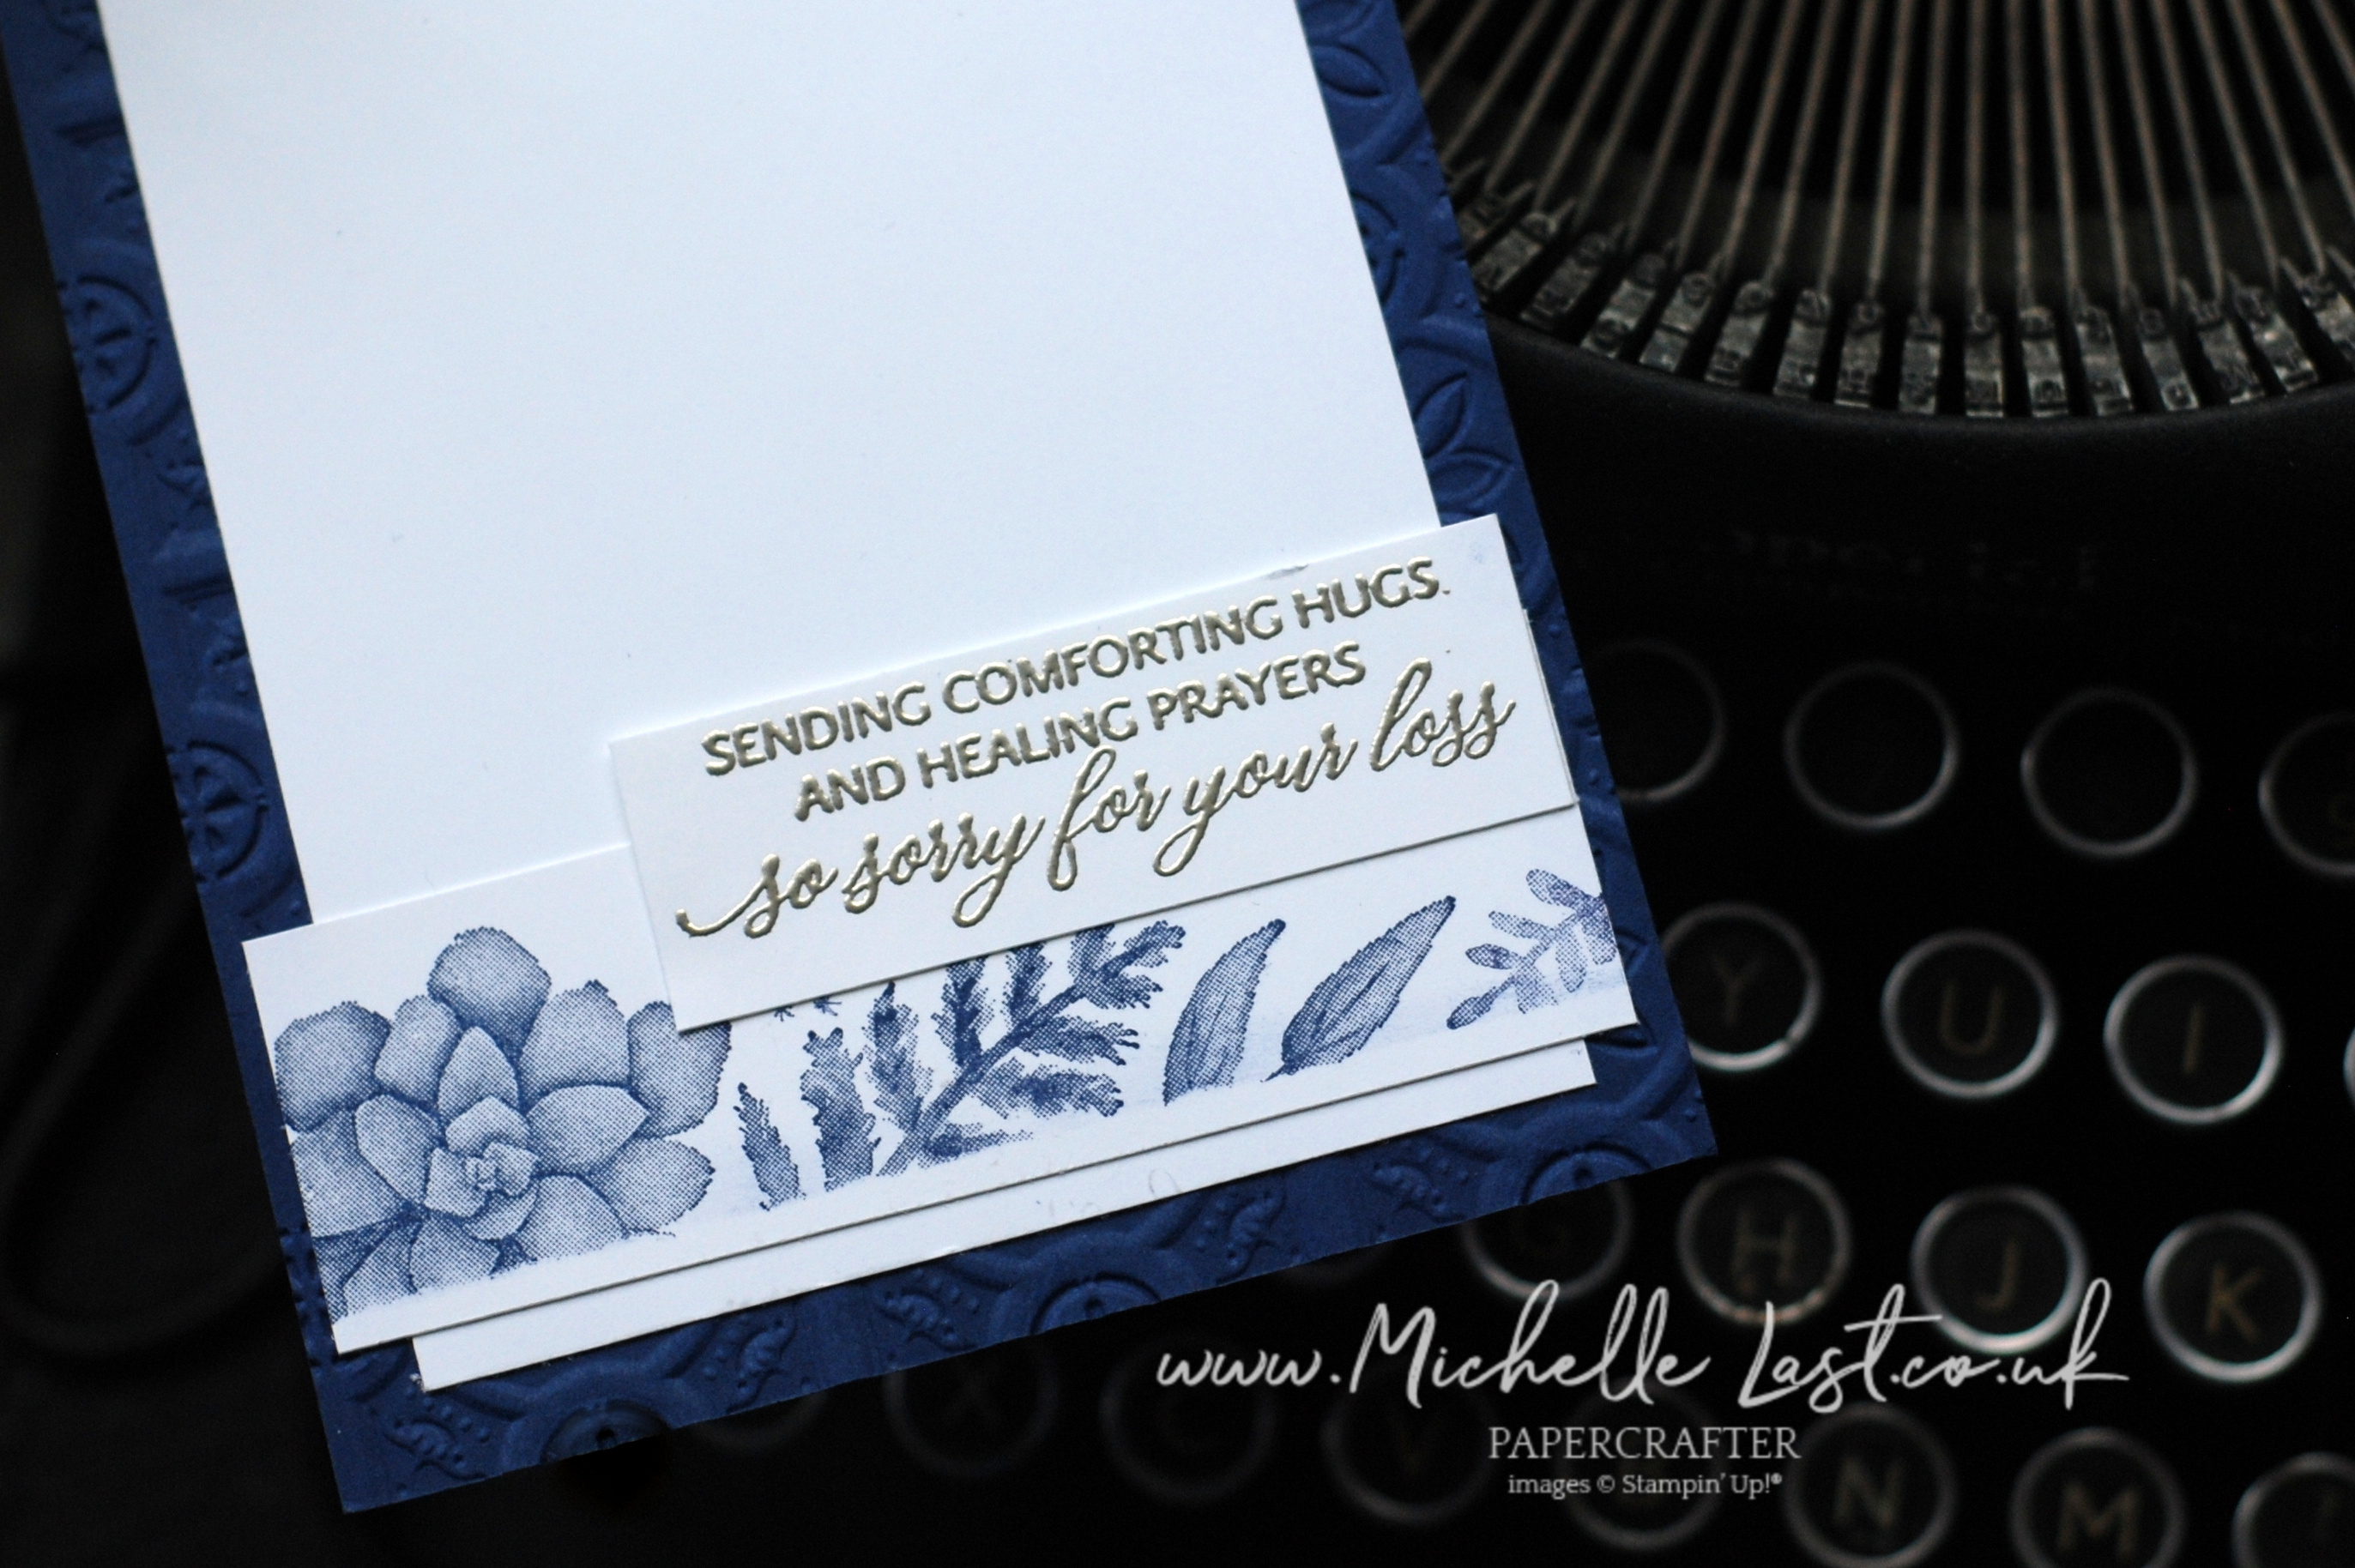 Condolence card using Stampin Up Supplies